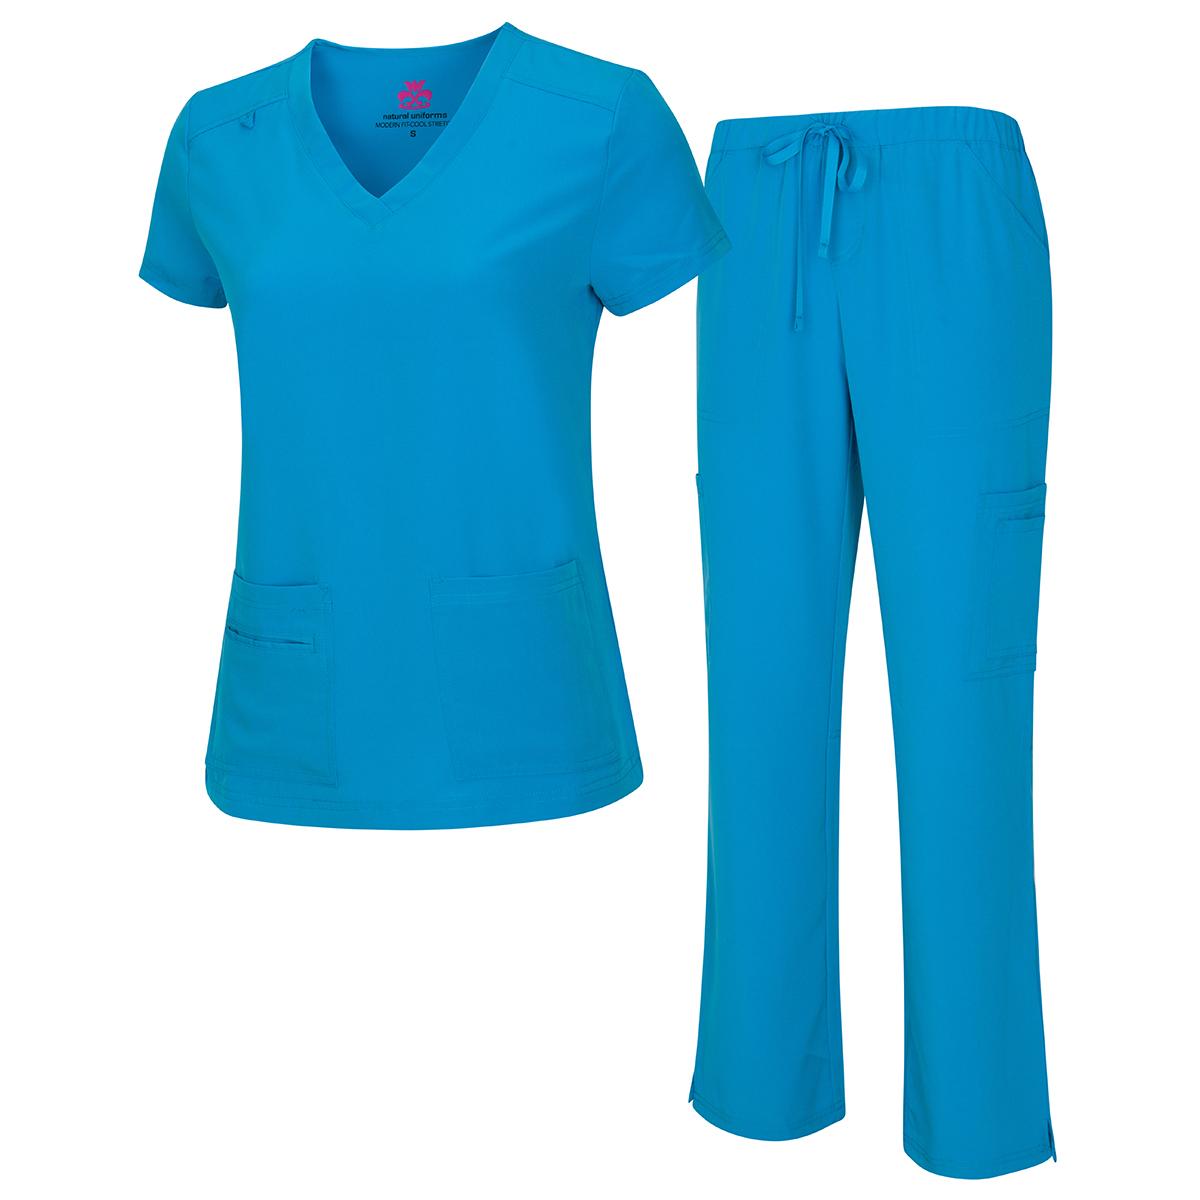 10 Pocket Cool Super Stretch Scrub Set - Natural Uniform -Natural Uniforms